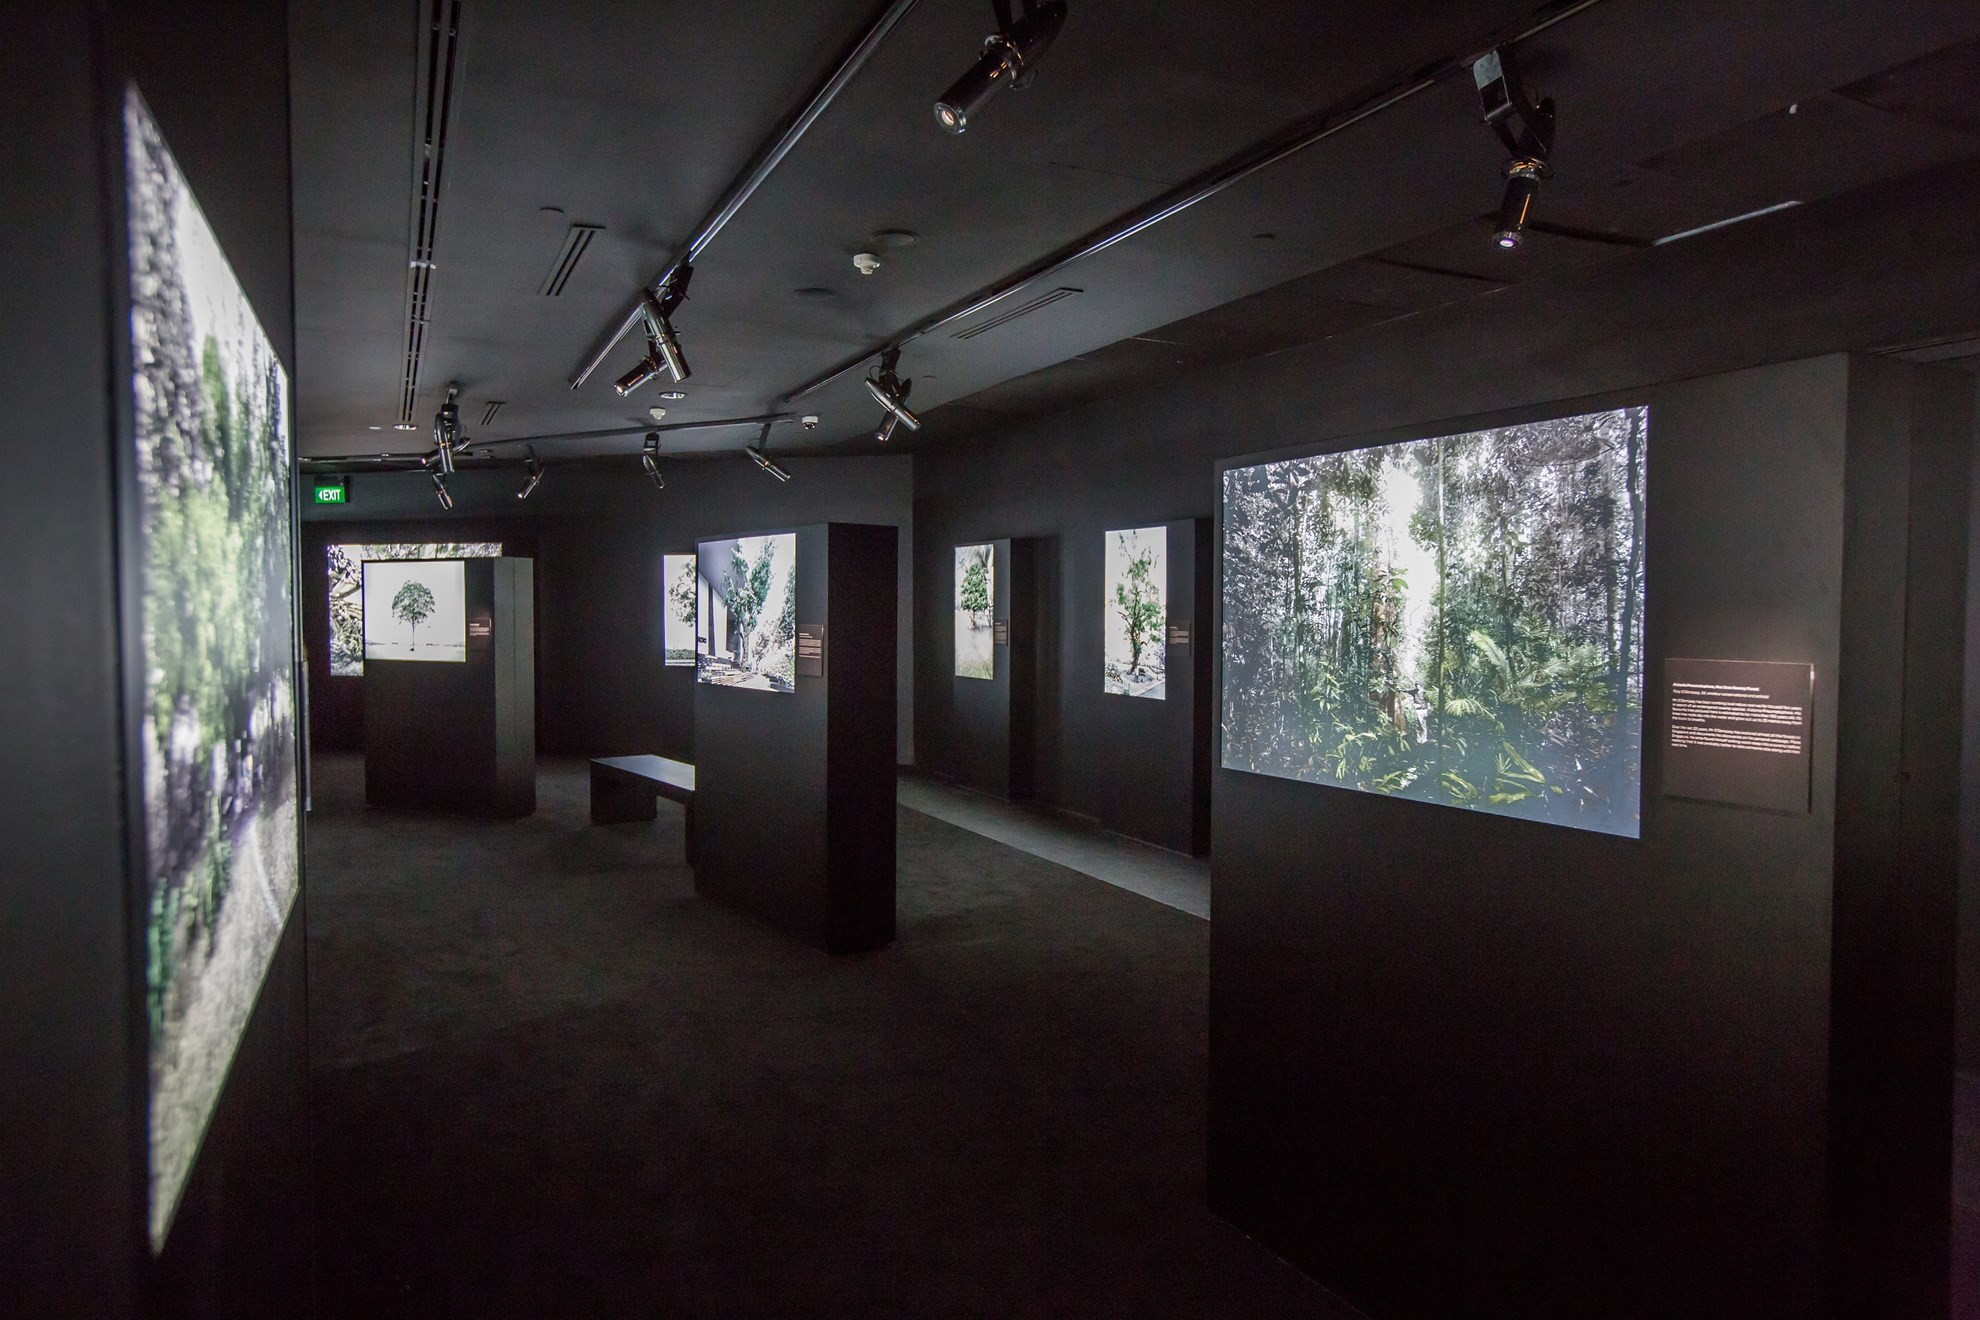 Vé tham quan Bảo tàng Quốc gia Singapore